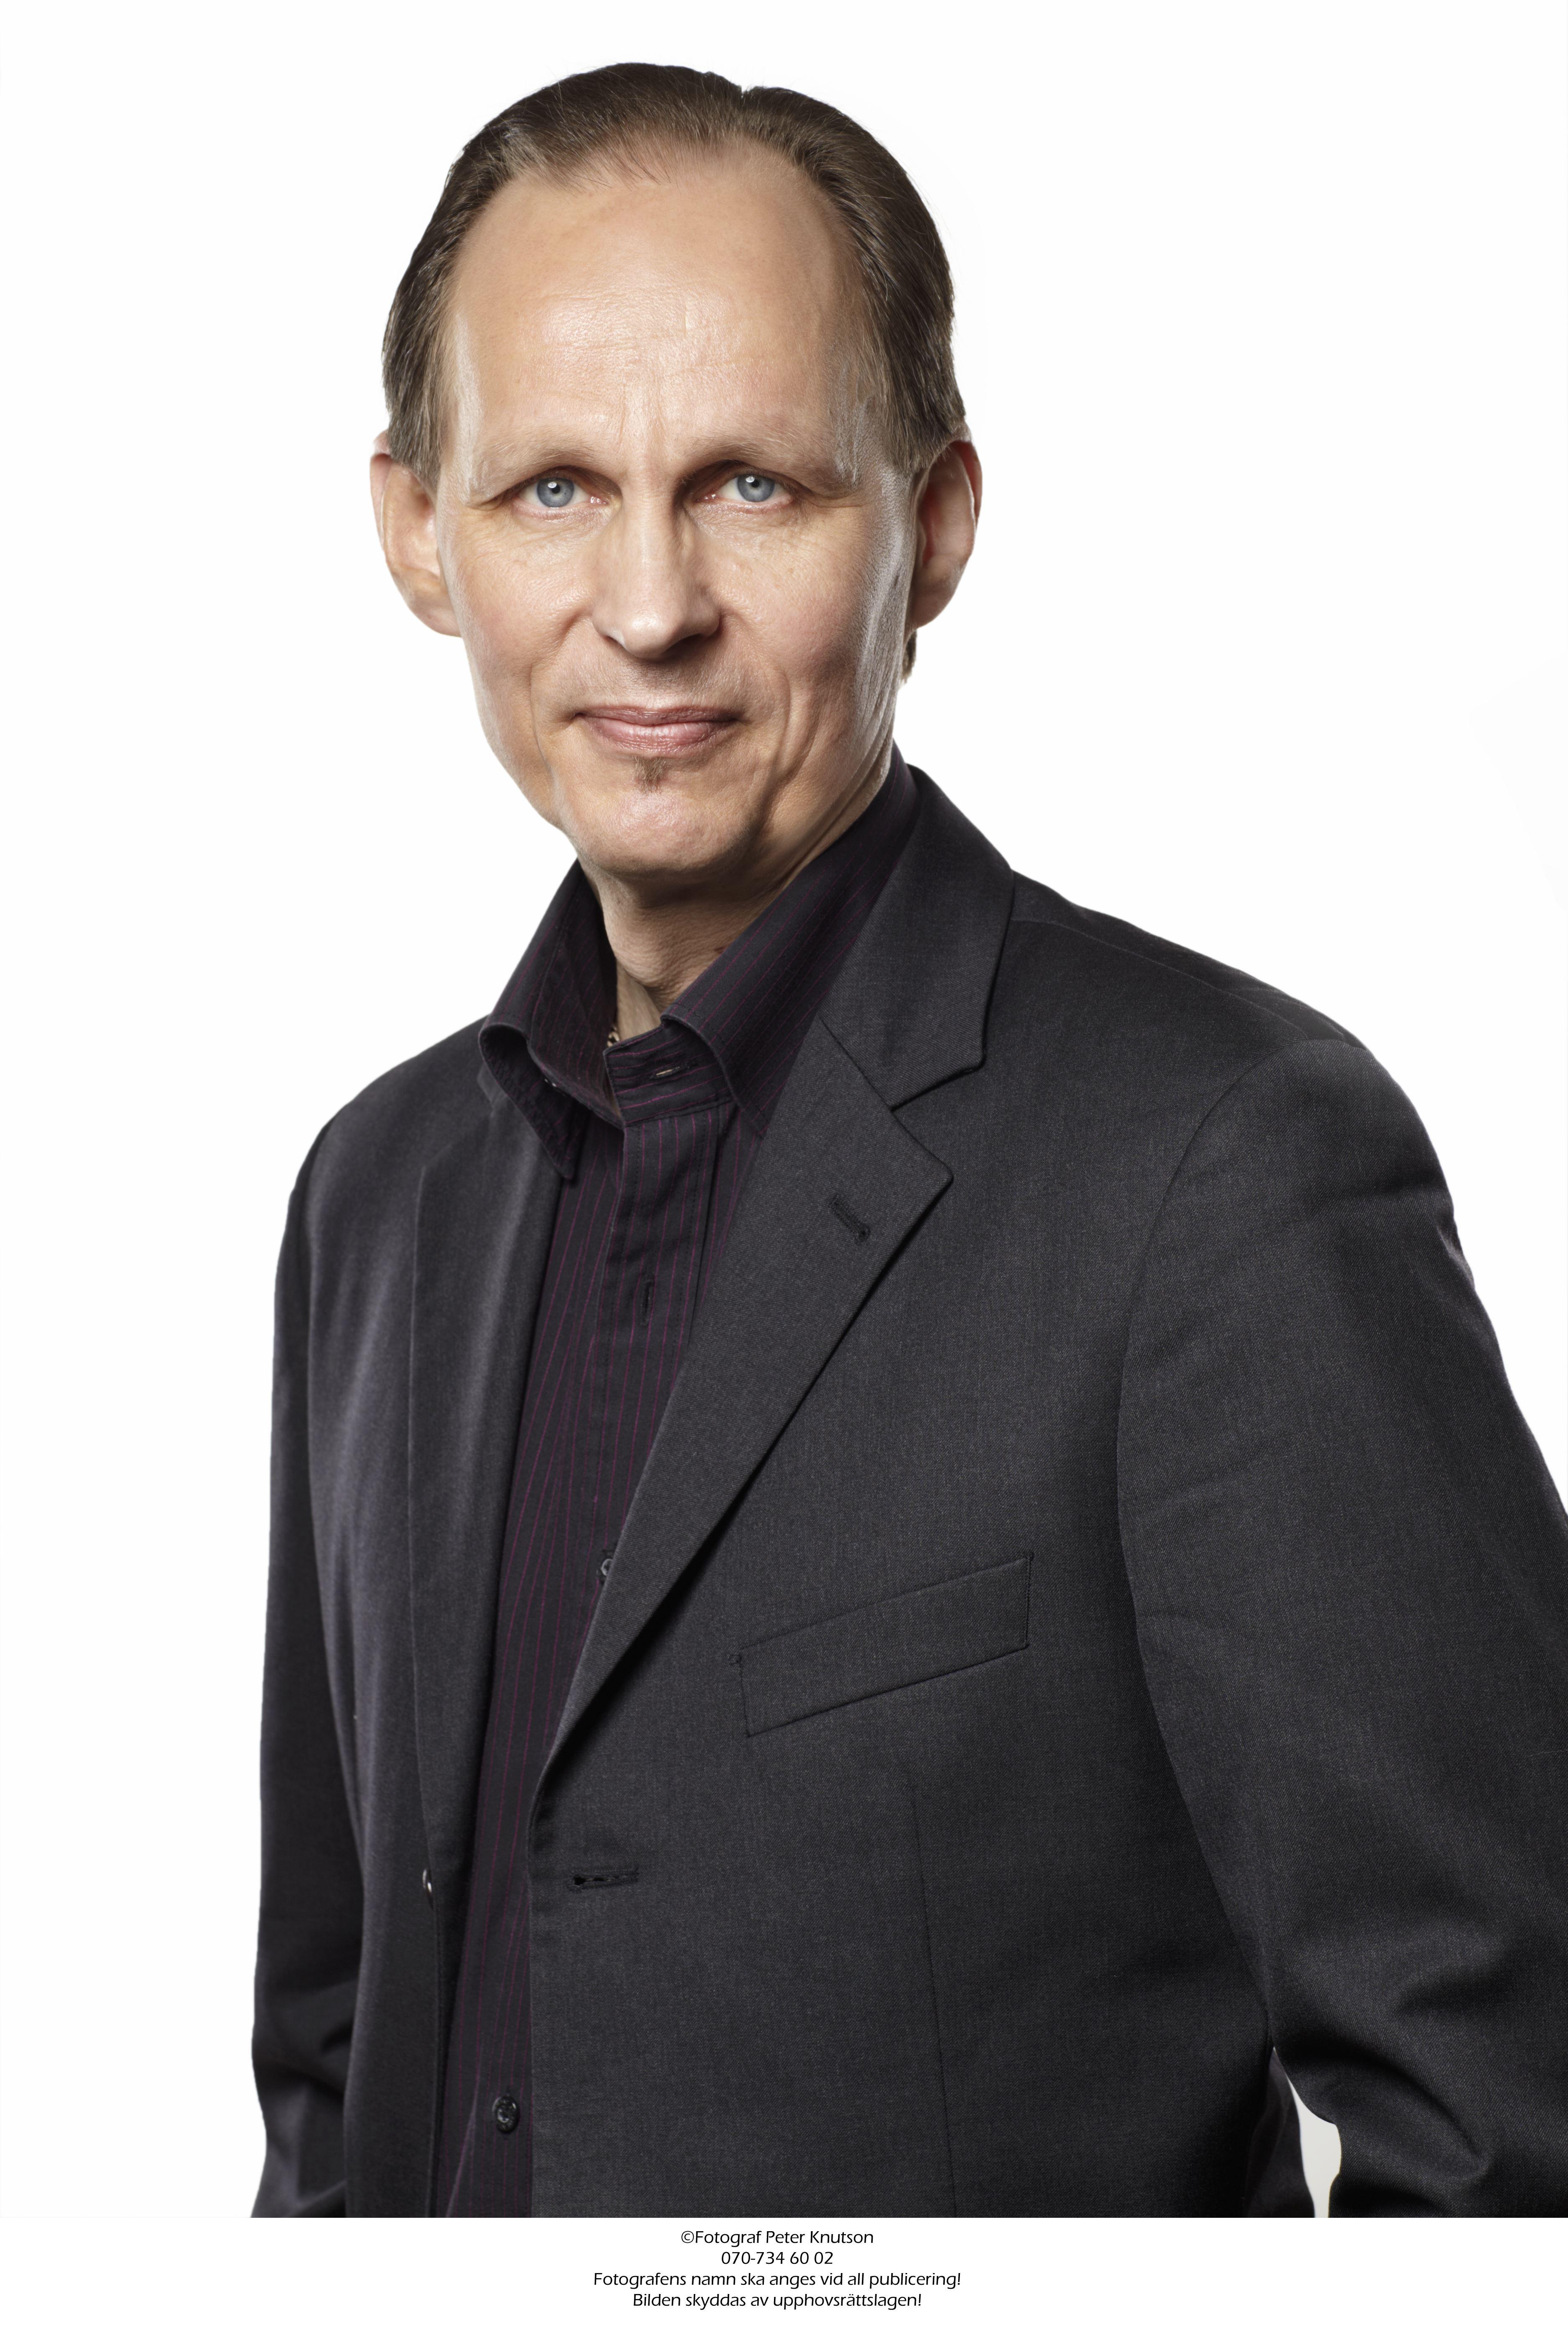 Peter Knutson, Röda scenen litteratur: Mikael Niemi Mikael